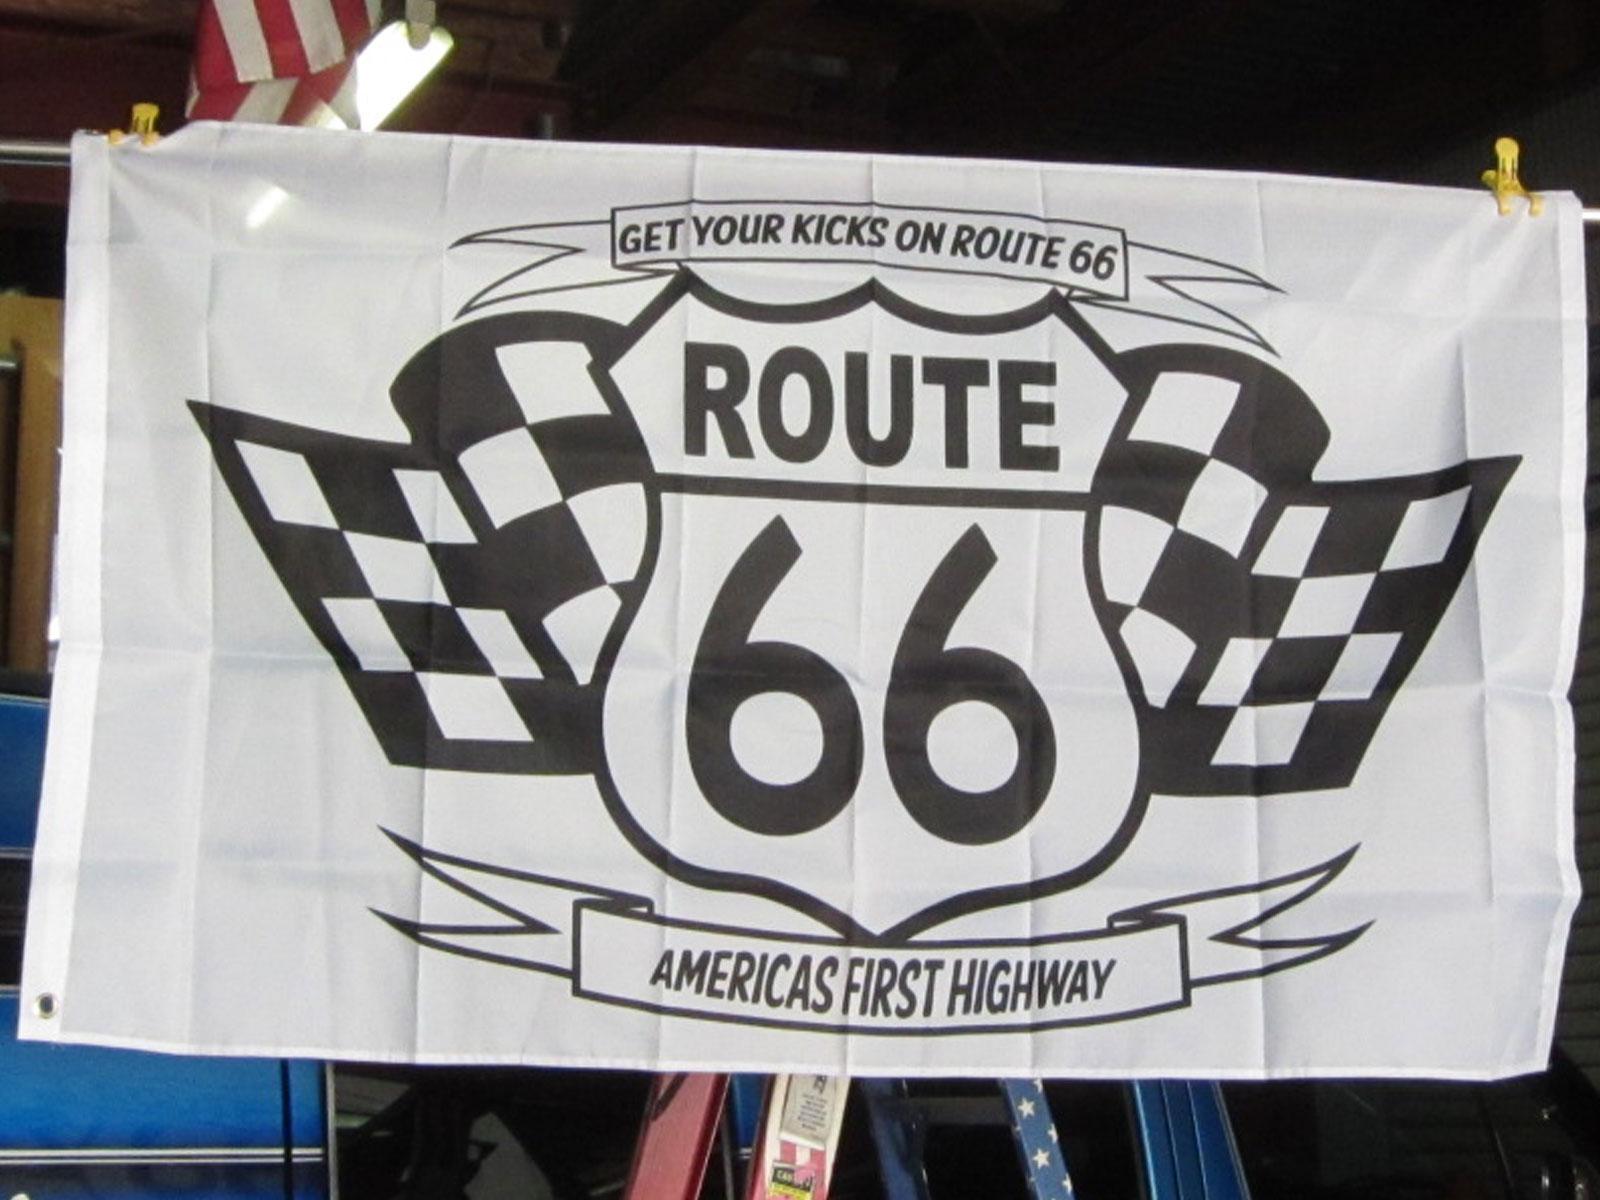 R66 CHECKER FLAG 3x5ft ★ルート66 チェッカー フラッグ [並行輸入品] シカゴ - サンタモニカ 国道66号線 マザーロード